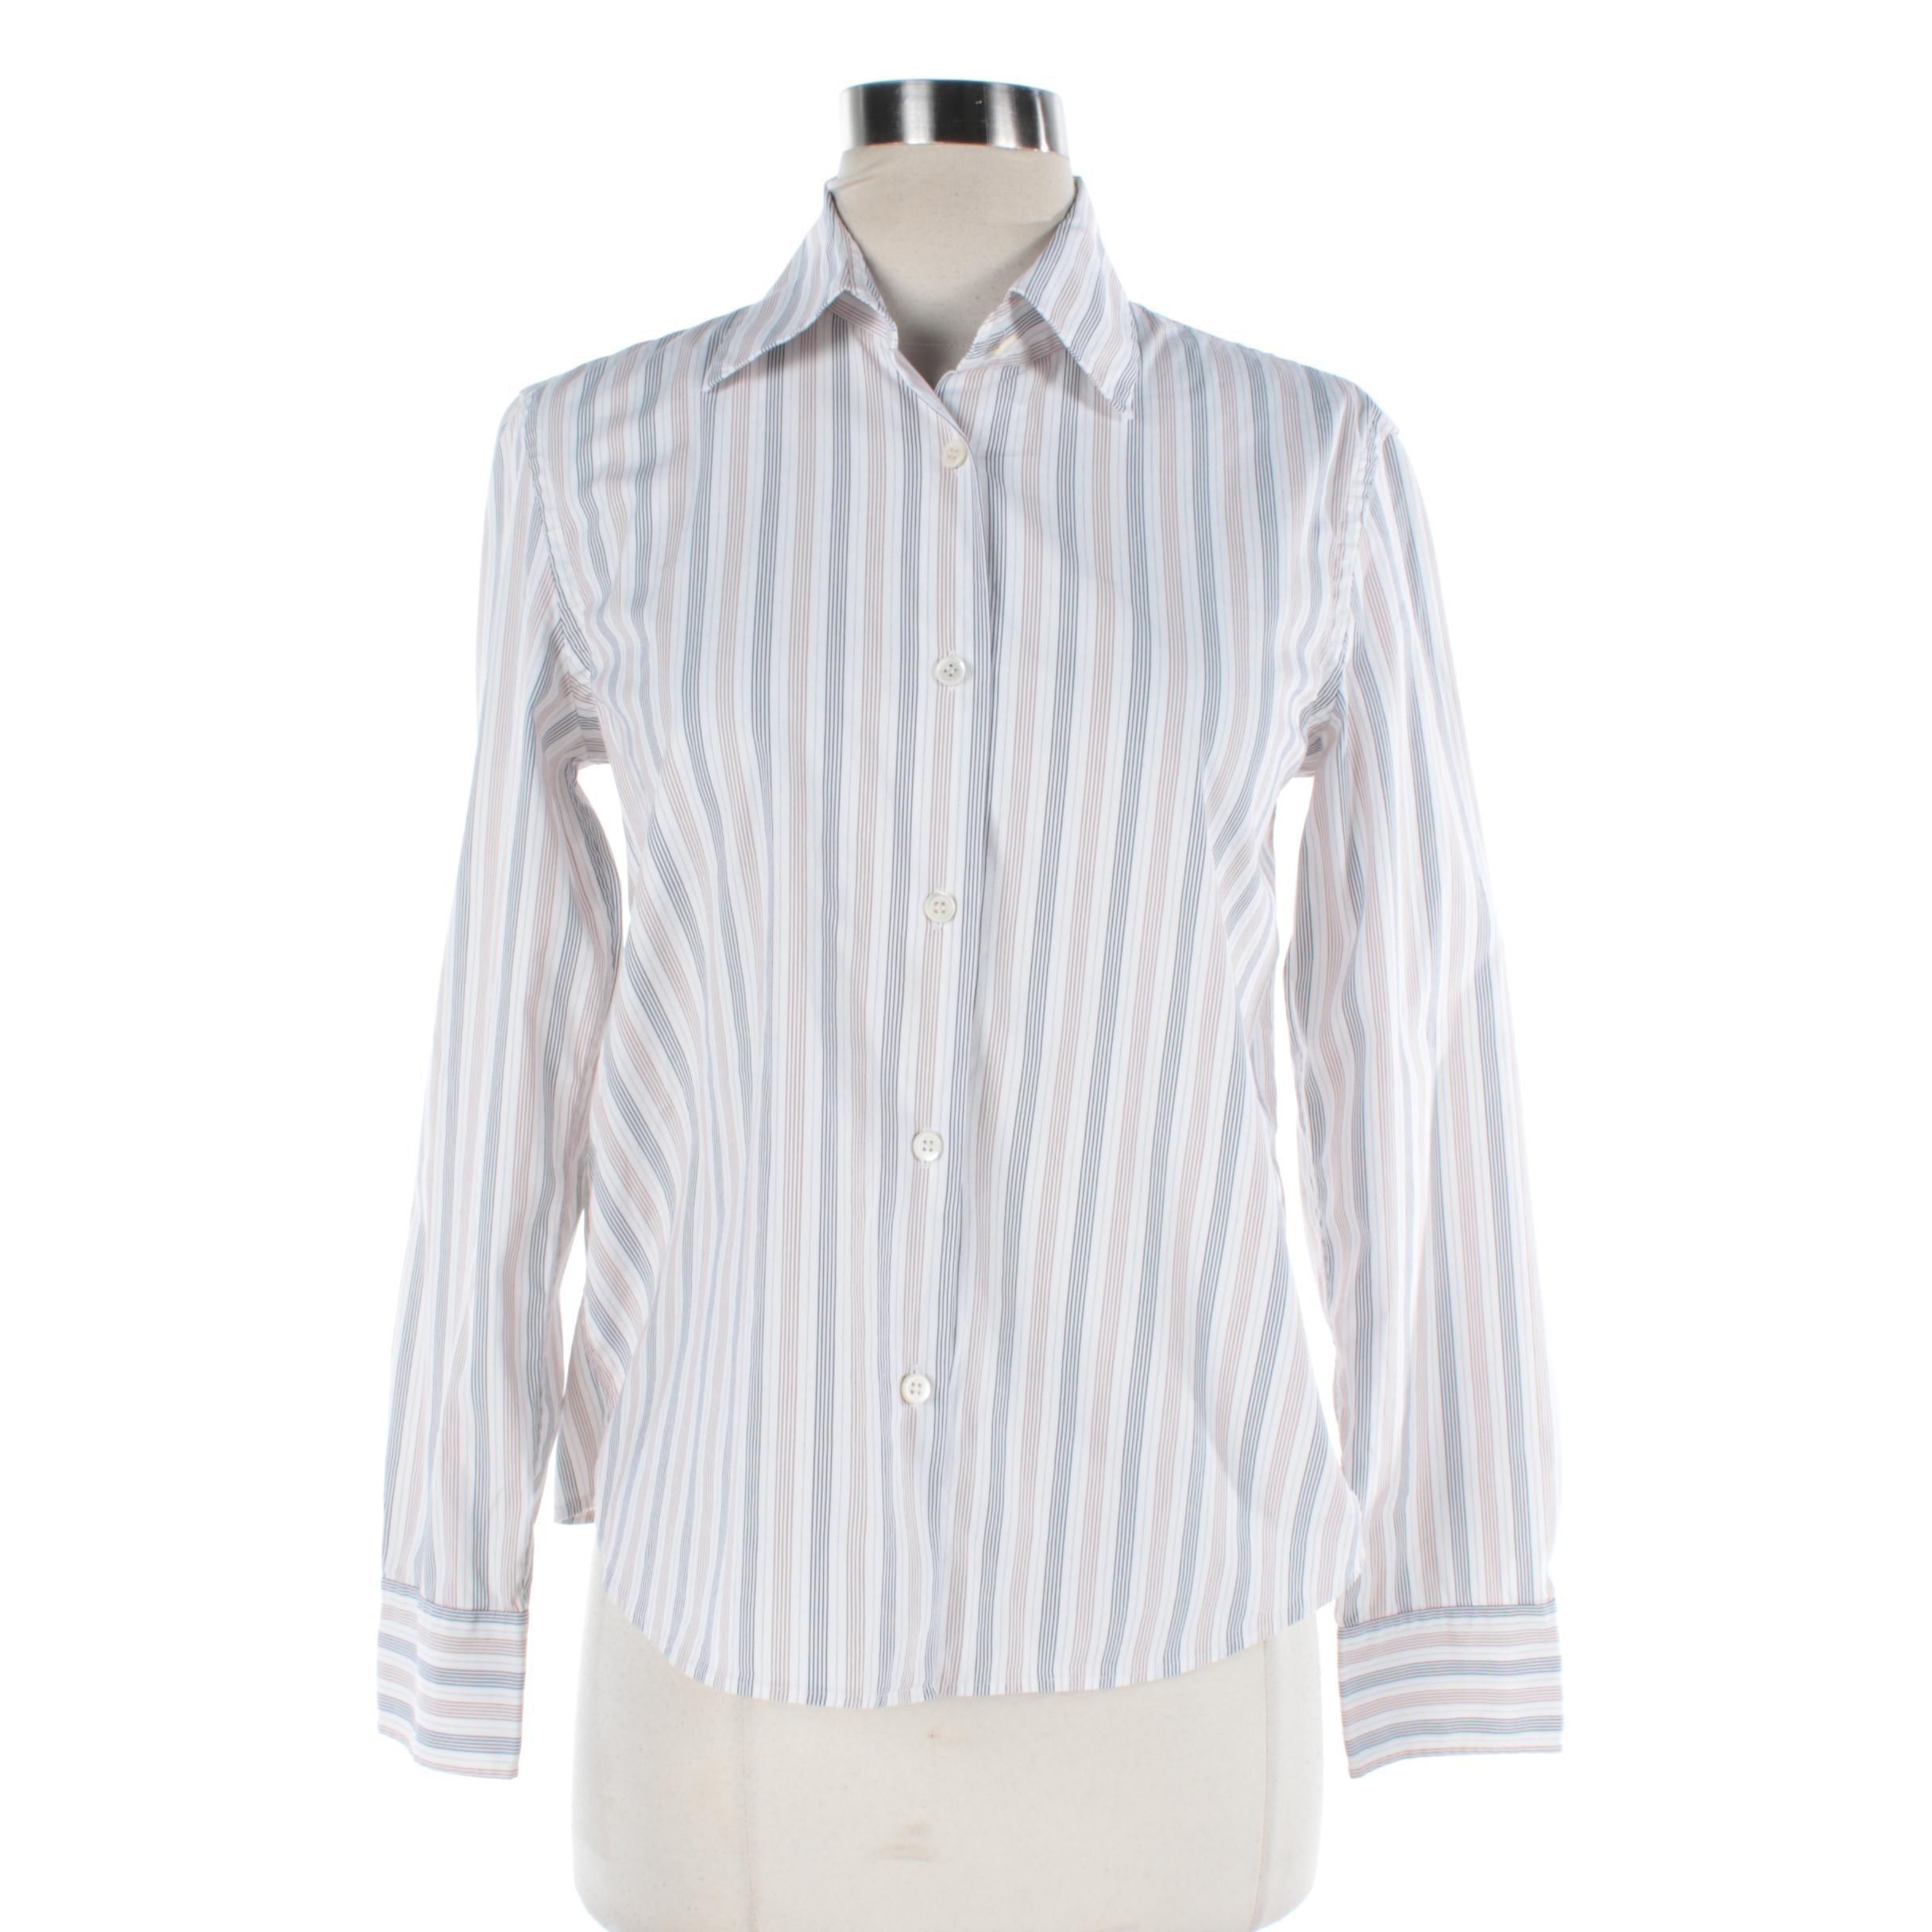 Women's Prada White, Beige and Navy Striped Button-Front Shirt